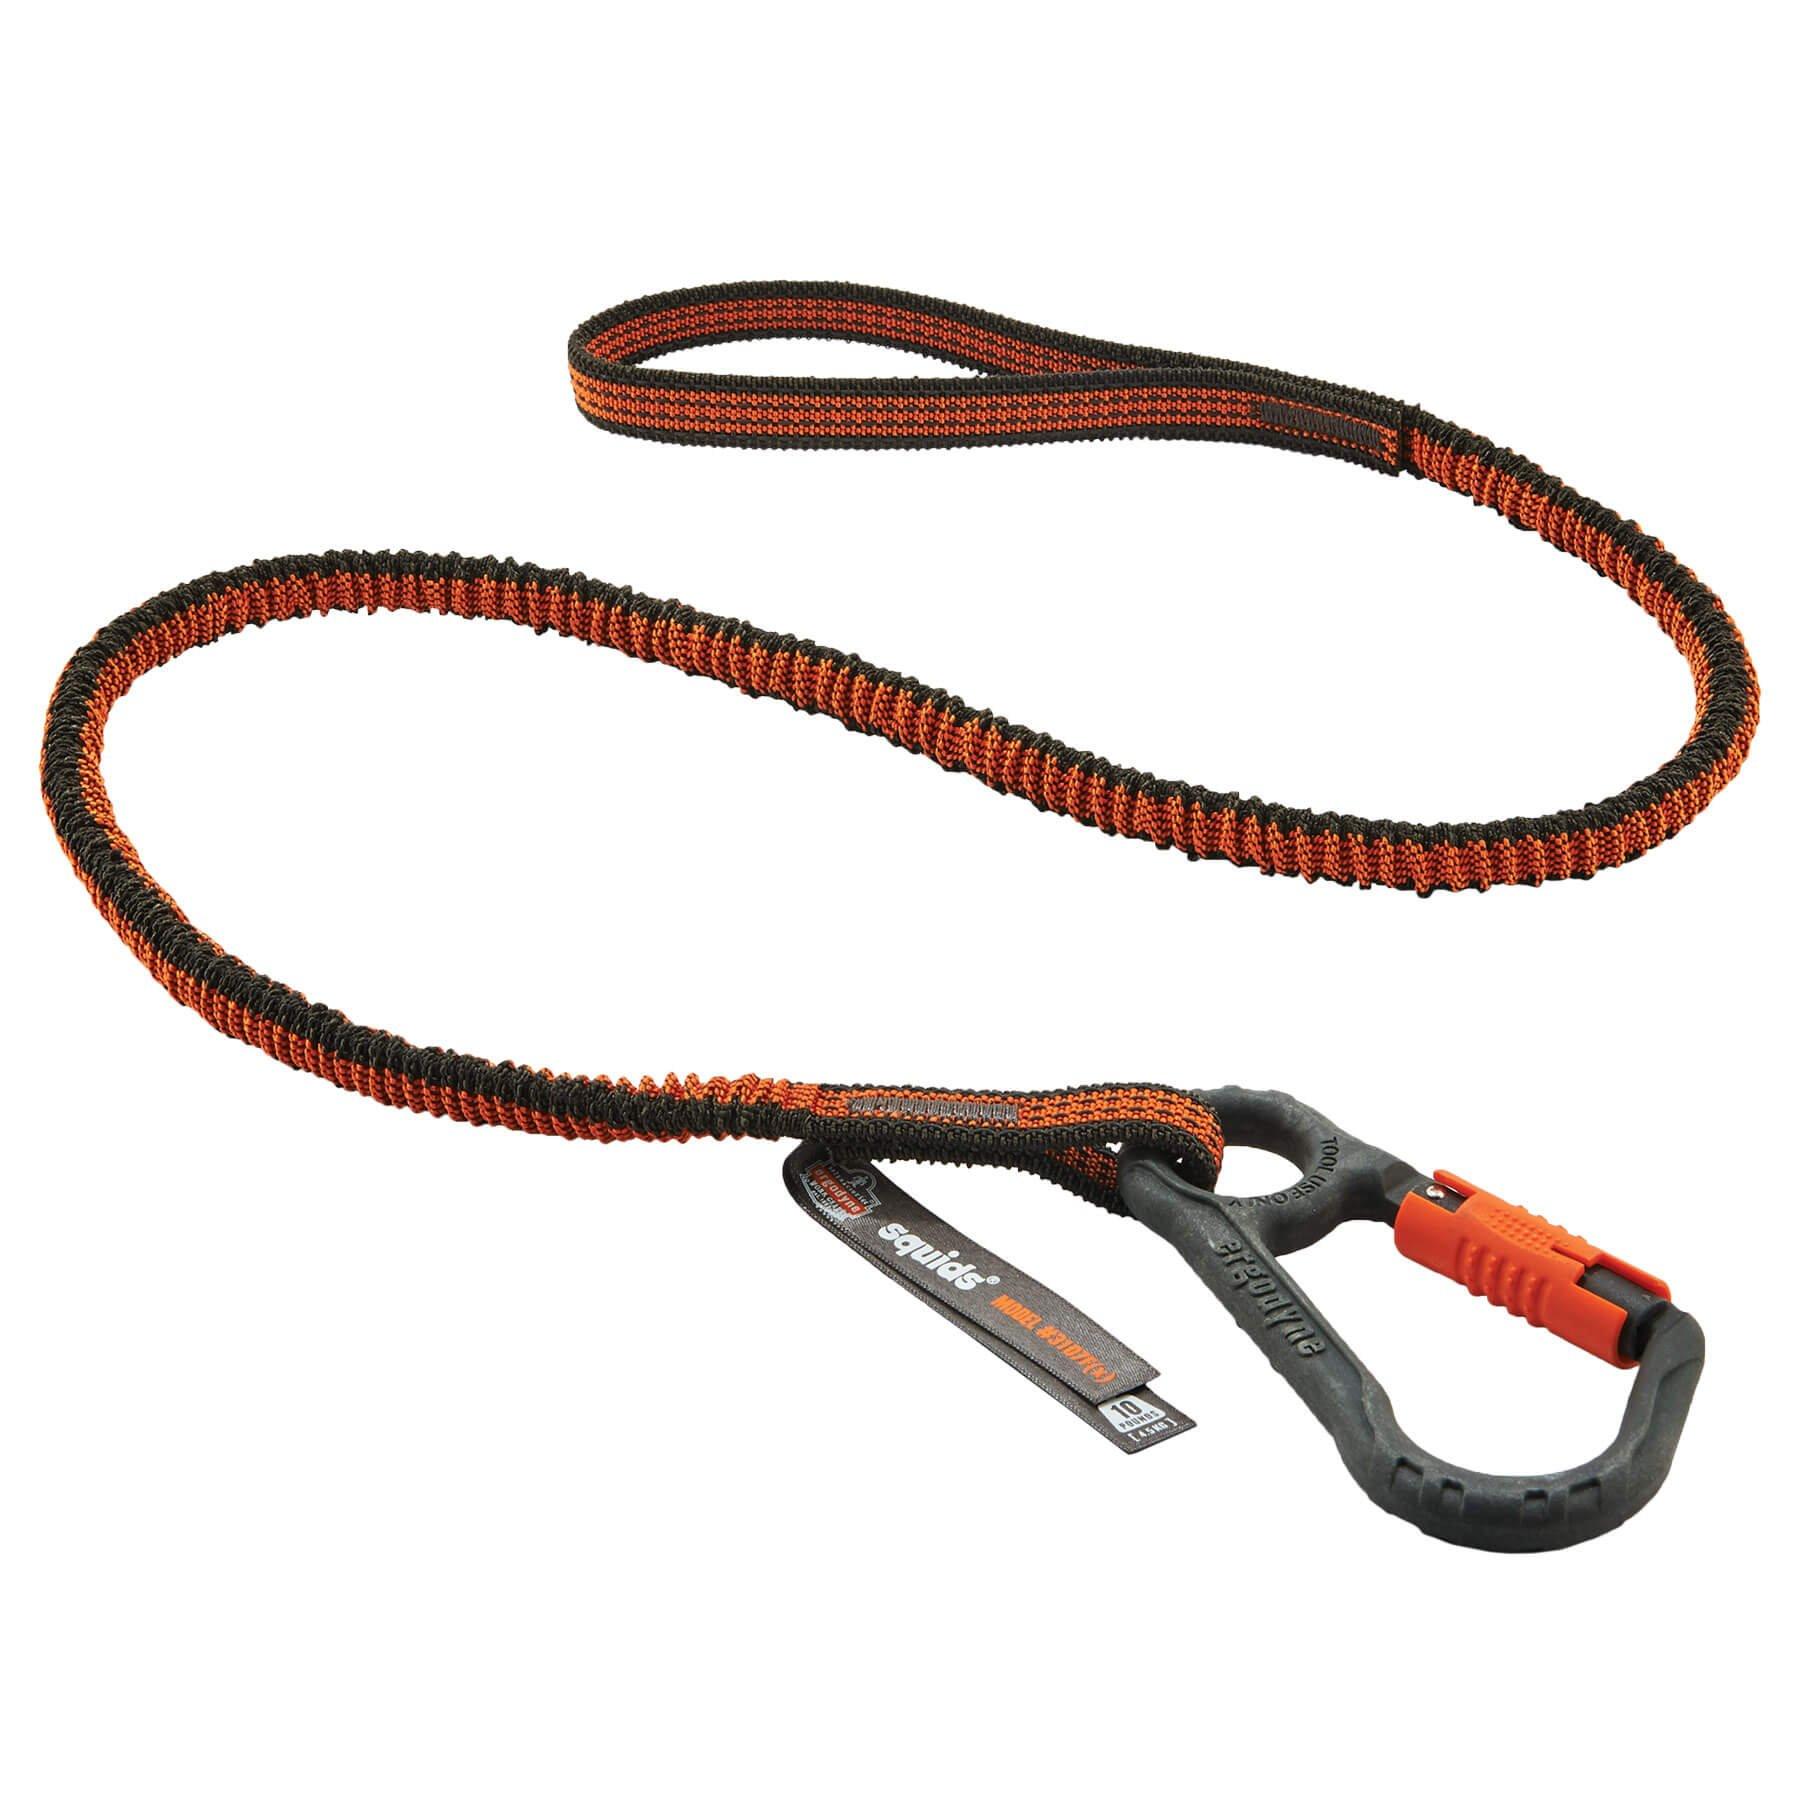 Ergodyne Squids 3107F(x) Shock Absorbing Tool Lanyard with Nylon Composite Locking Carabiner, 10 Pounds by Ergodyne (Image #1)